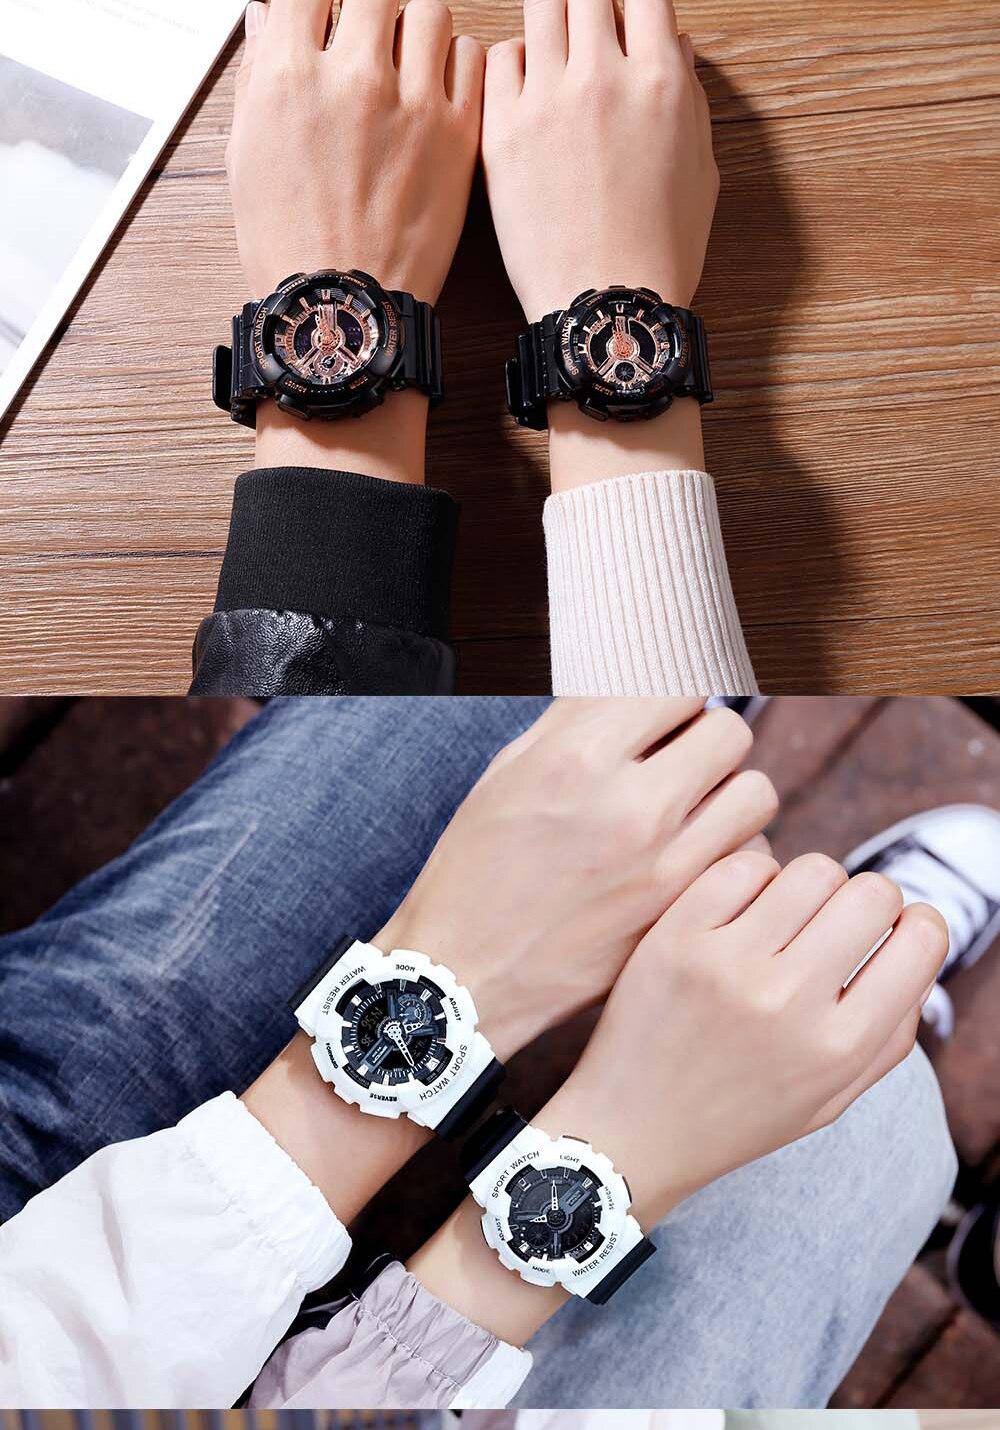 Heab6532fad384798aa27c57033a3d819w 2020 SANDA Military Men's Watch Brand Luxury Waterproof Sport Wristwatch Fashion Quartz Clock Couple Watch relogio masculino